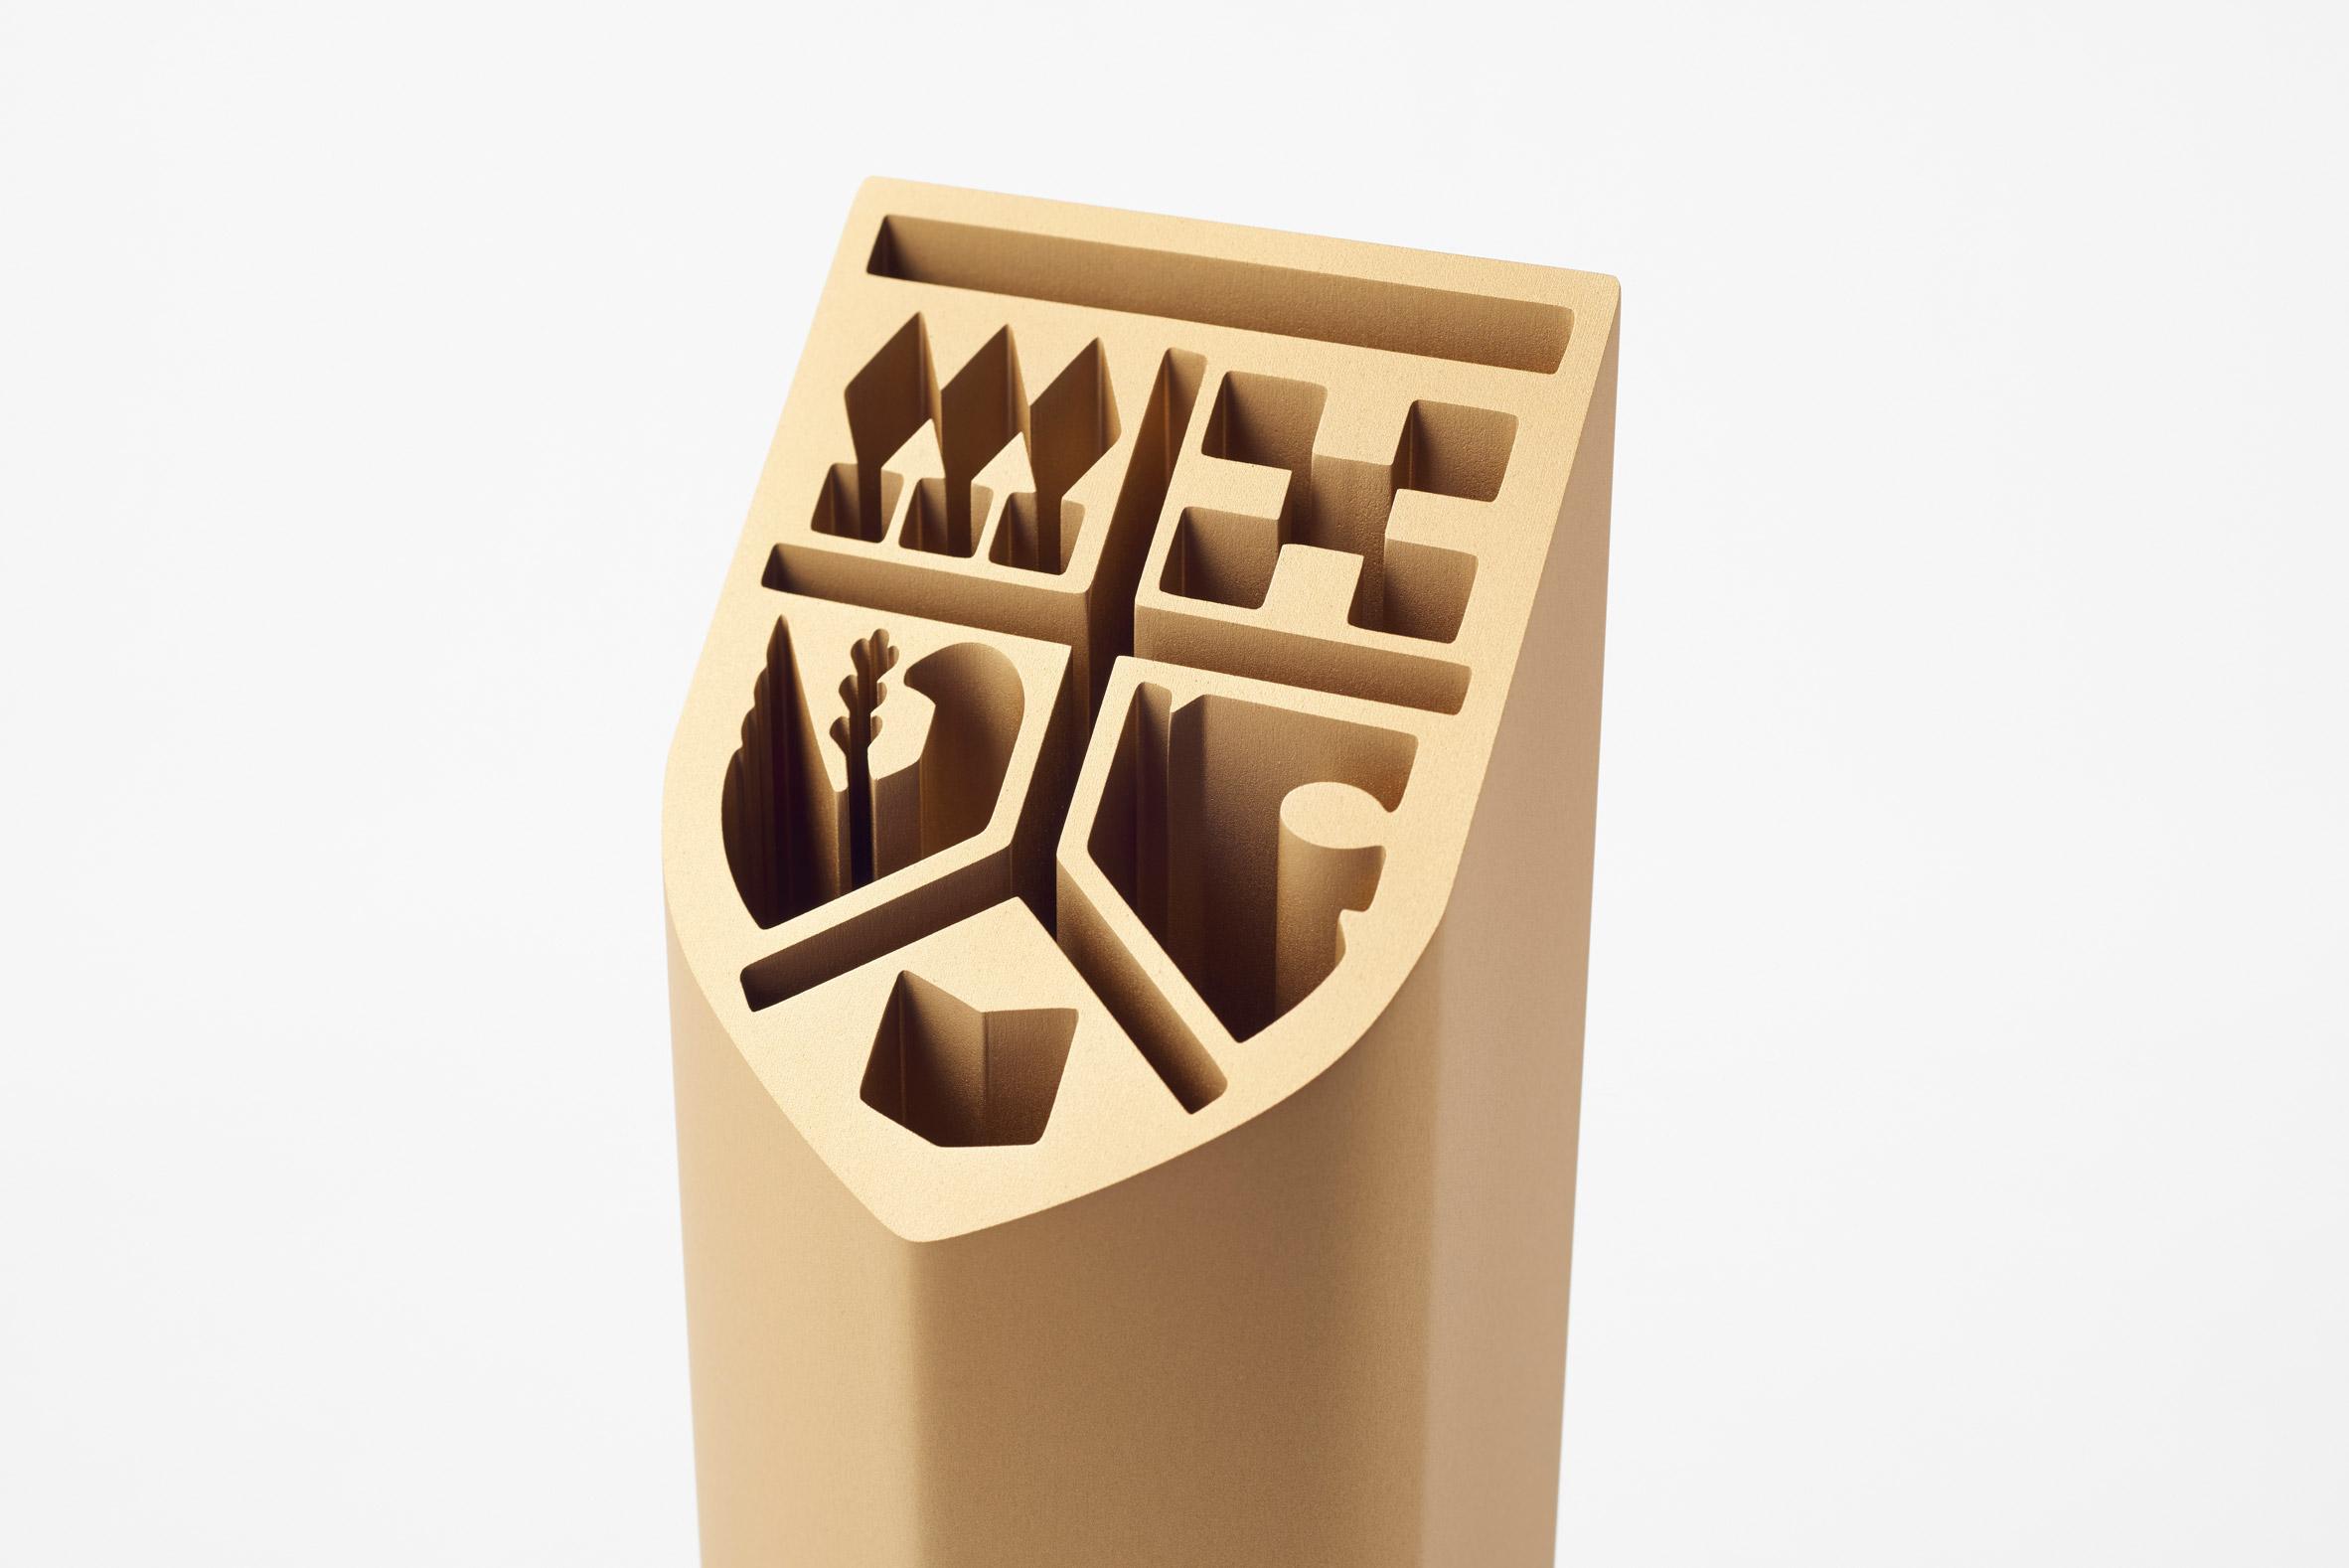 UNIVAS logo on trophy by Nendo